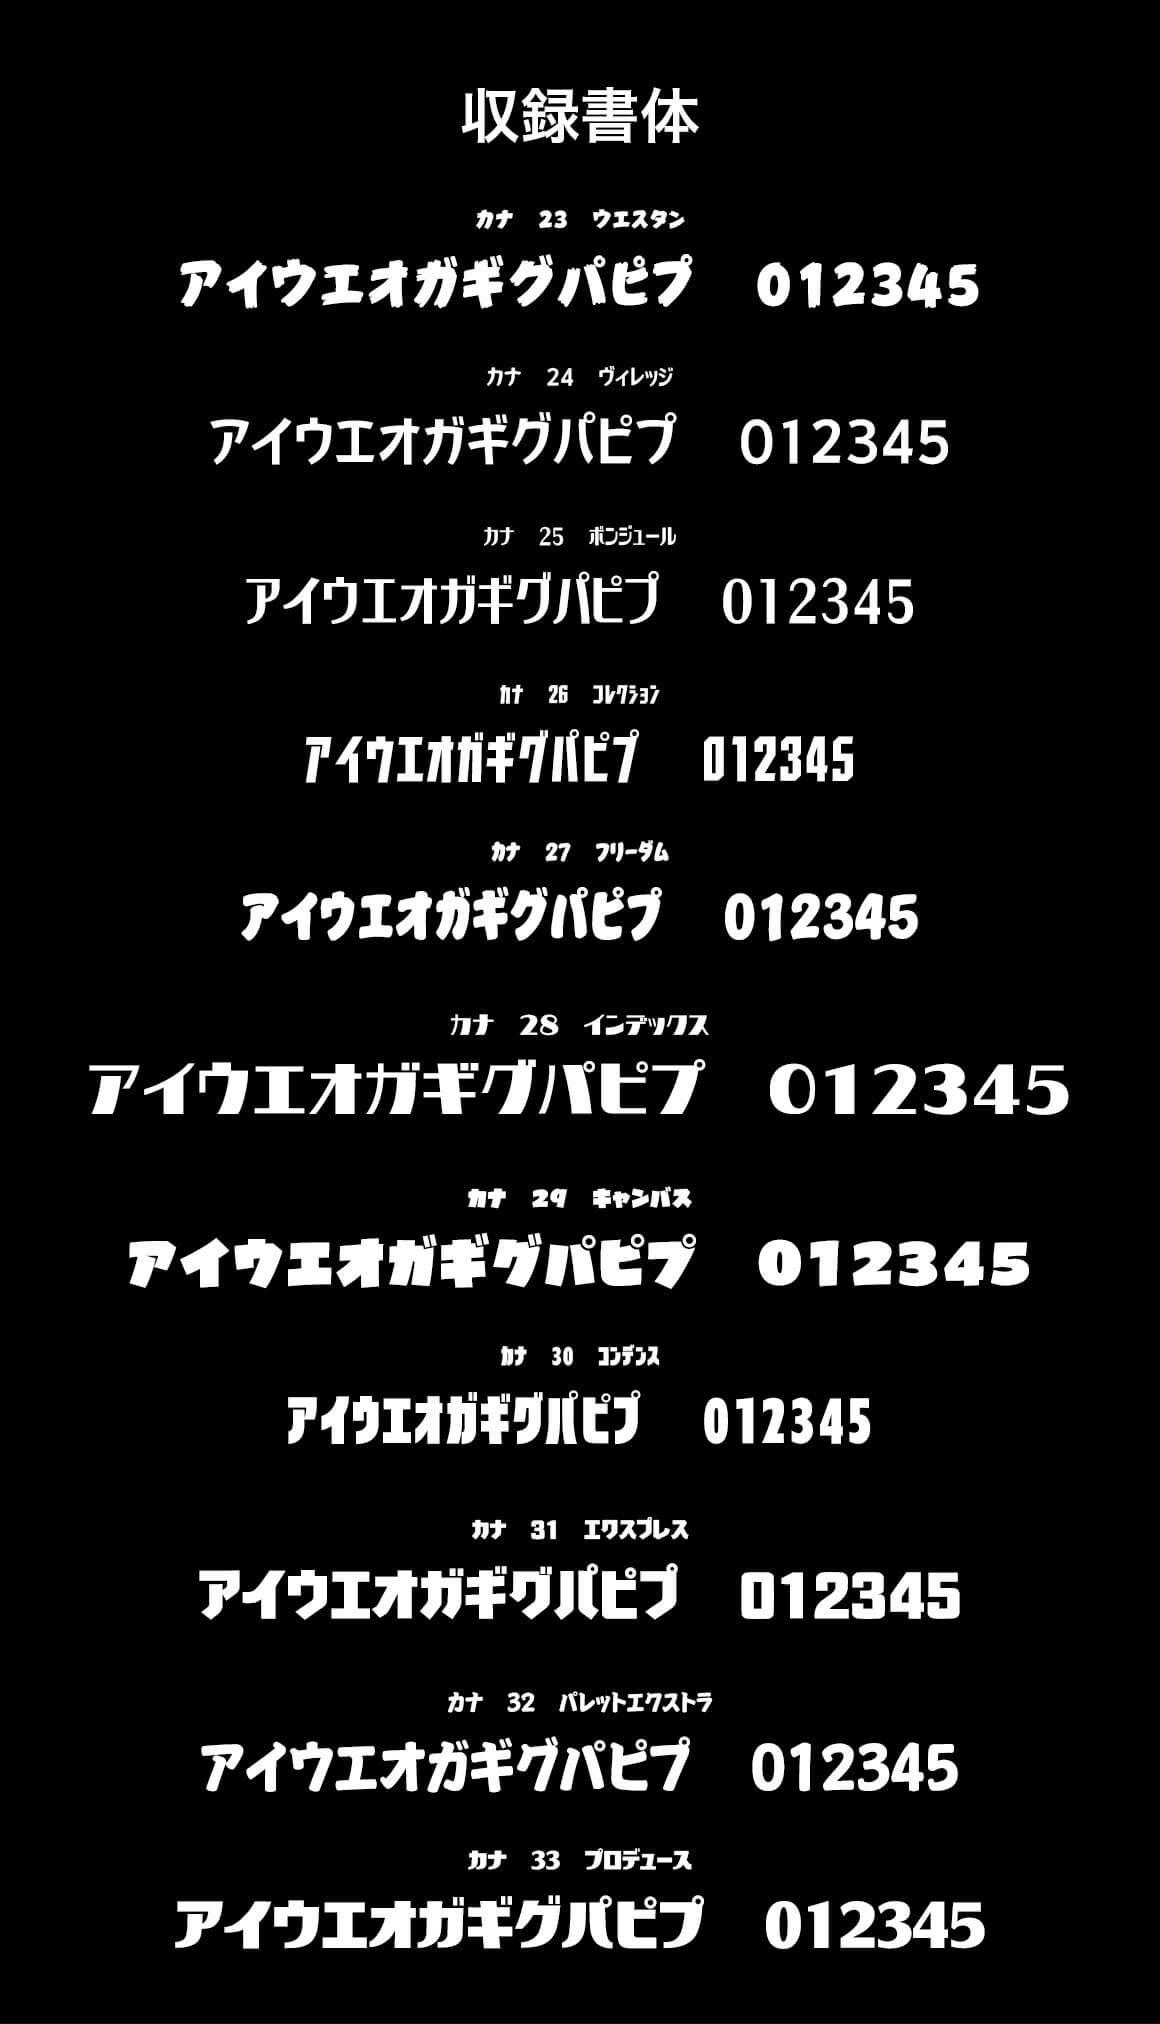 letterform-the-versatile-japanese-fonts-collection-3